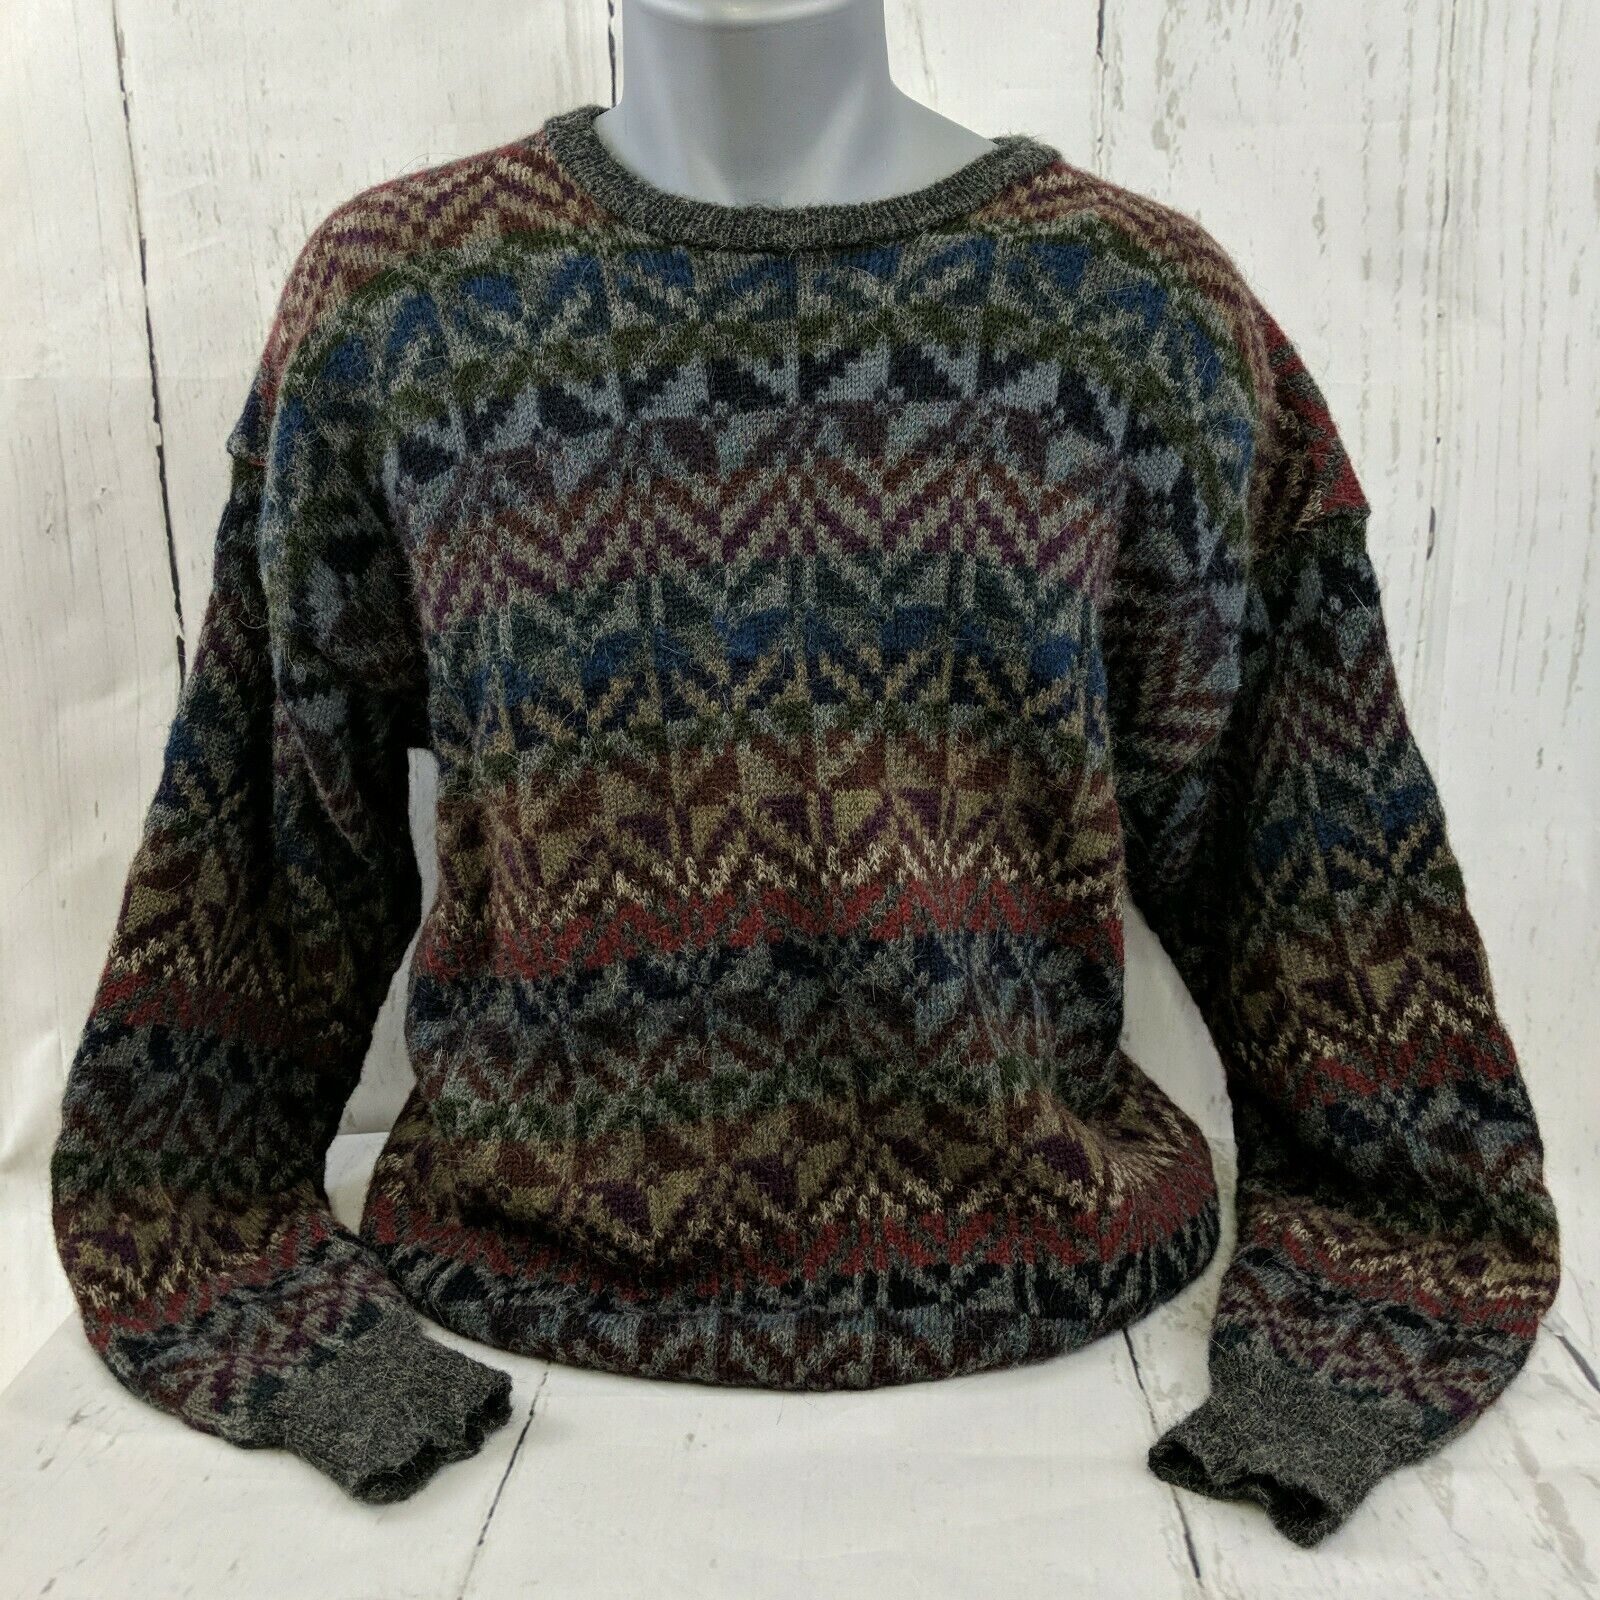 Millma 100% Alpaca Handloomed Sweater Size Large